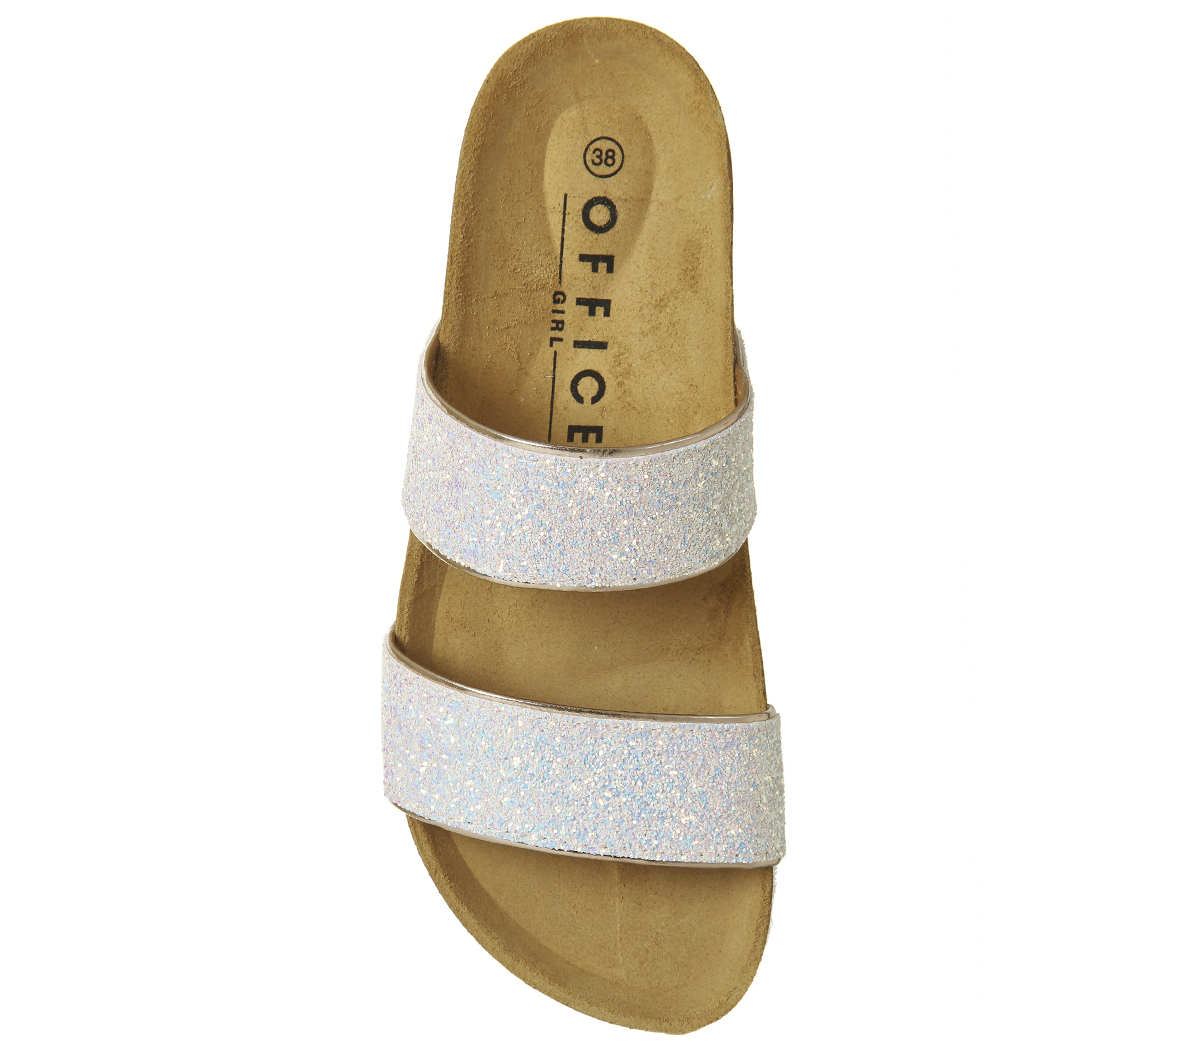 dd6c6b92b189 Womens Office Magnetic 2 Footbed Sliders Pink Glitter Sandals